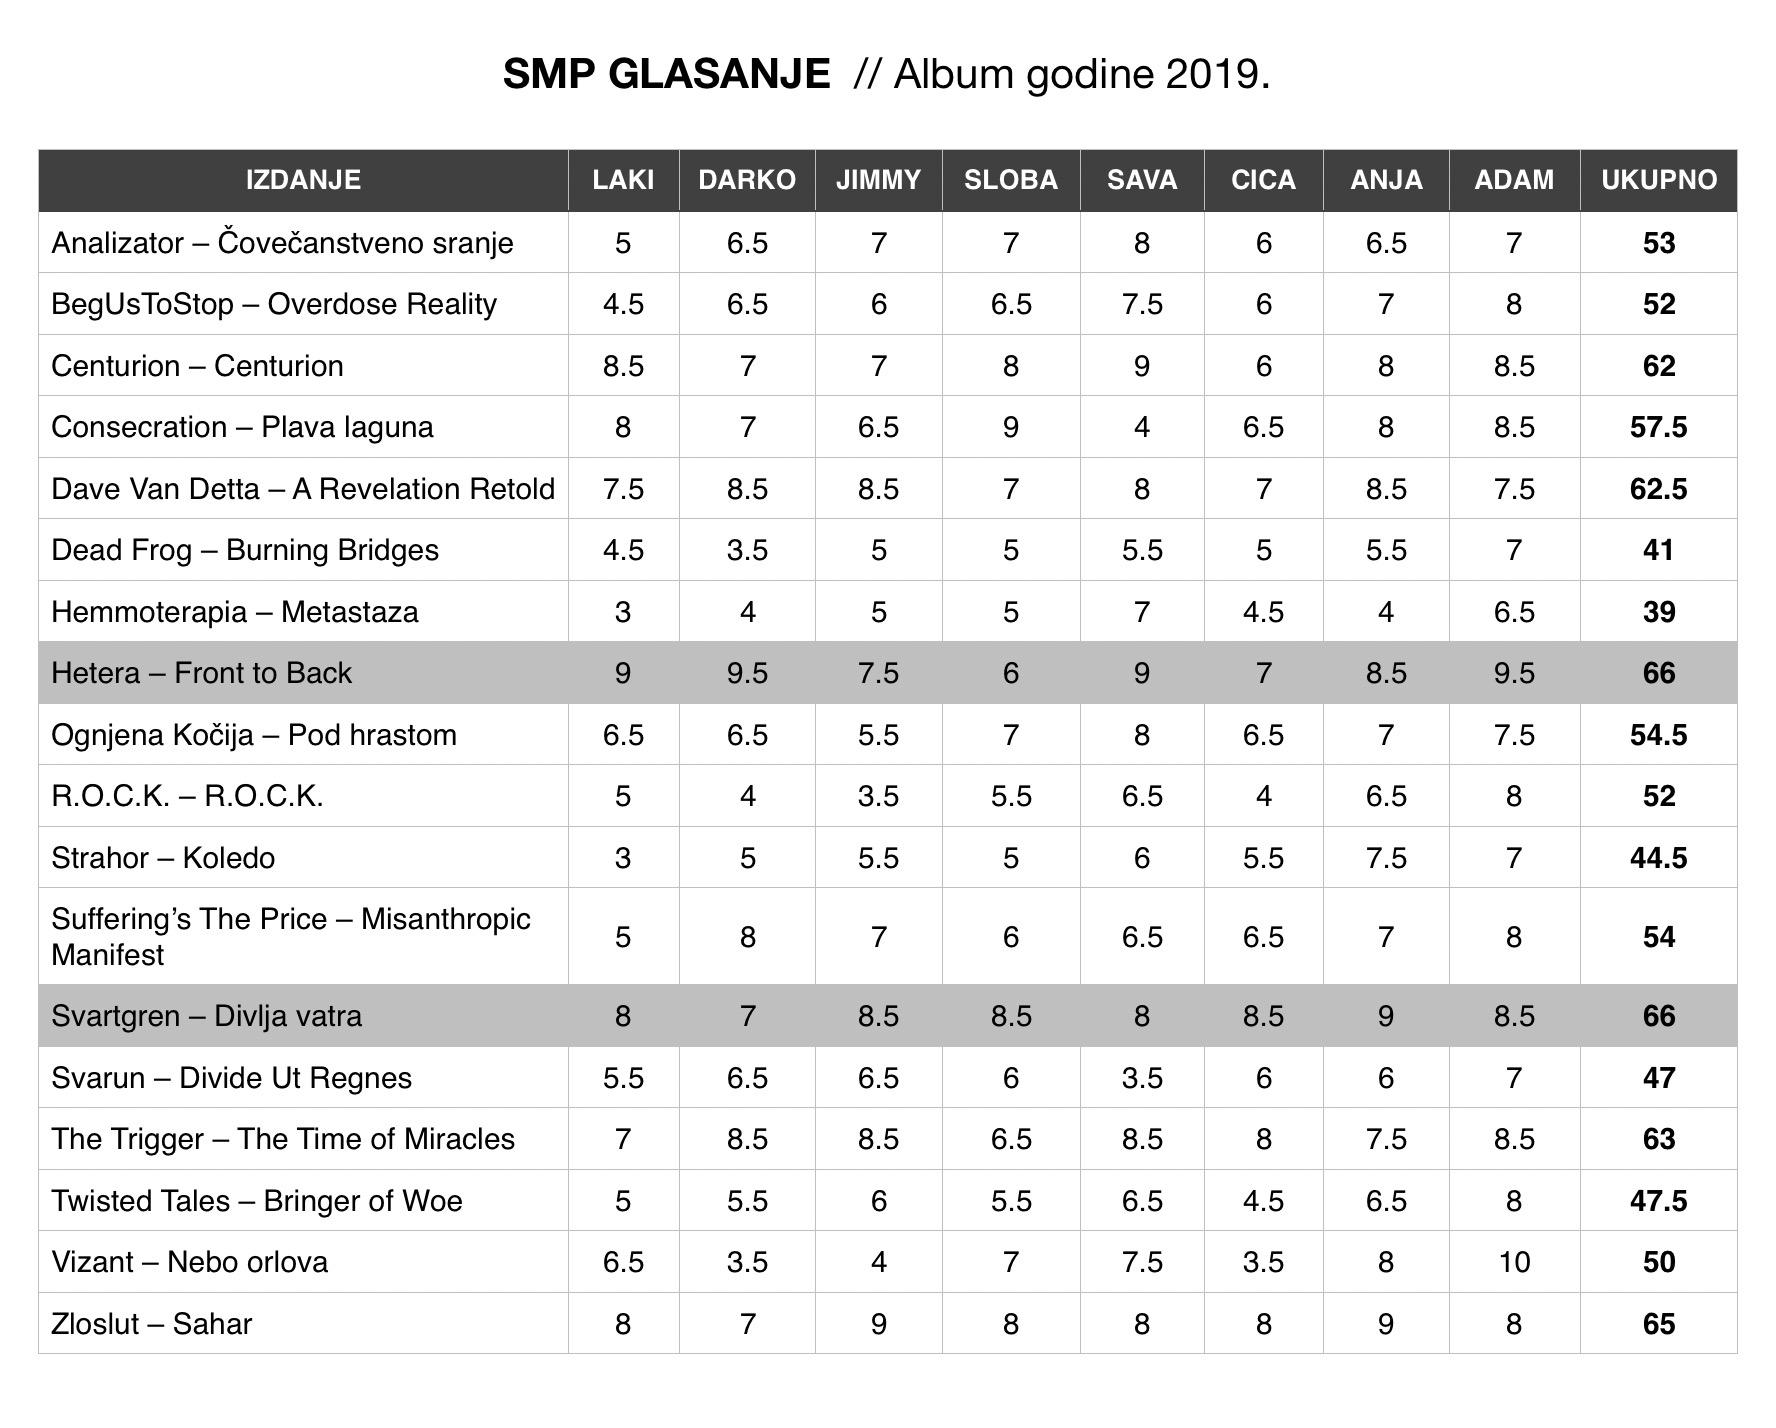 SMP Album godine 2019 - Svartgren i Hetera